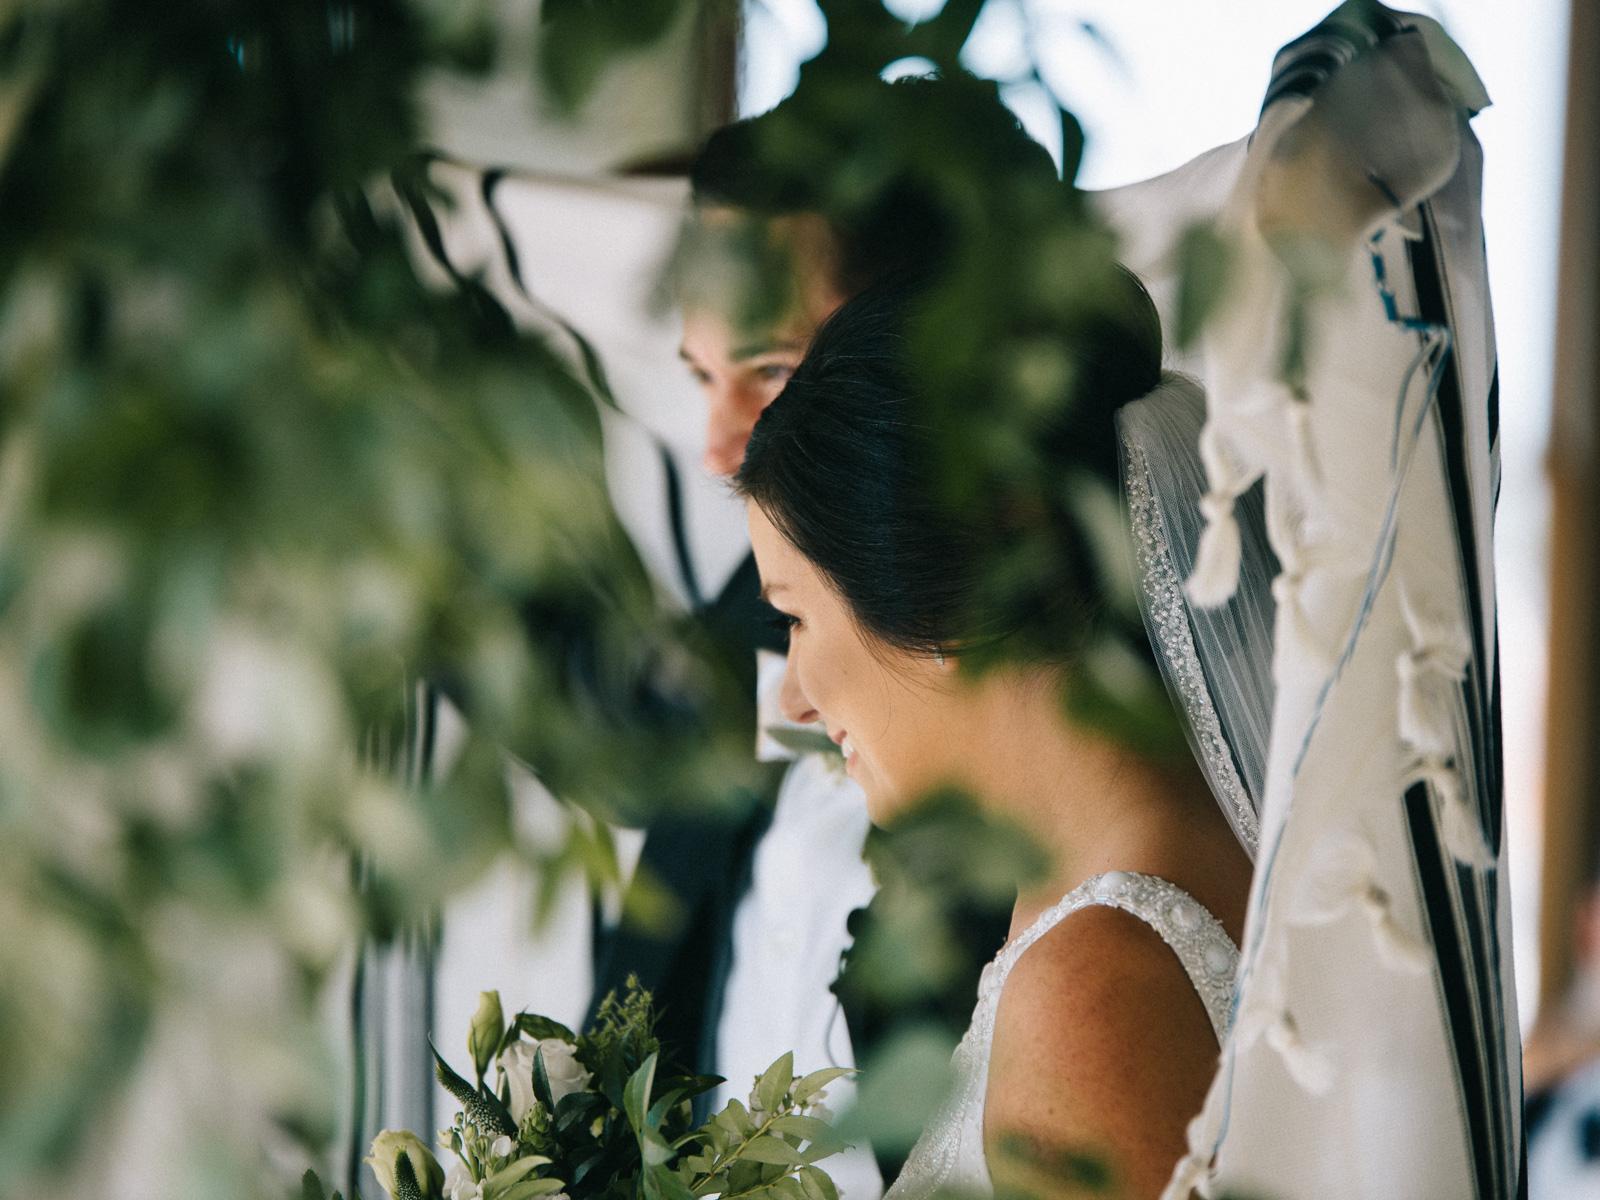 OKC rooftop wedding josh mccullock-9999.jpg